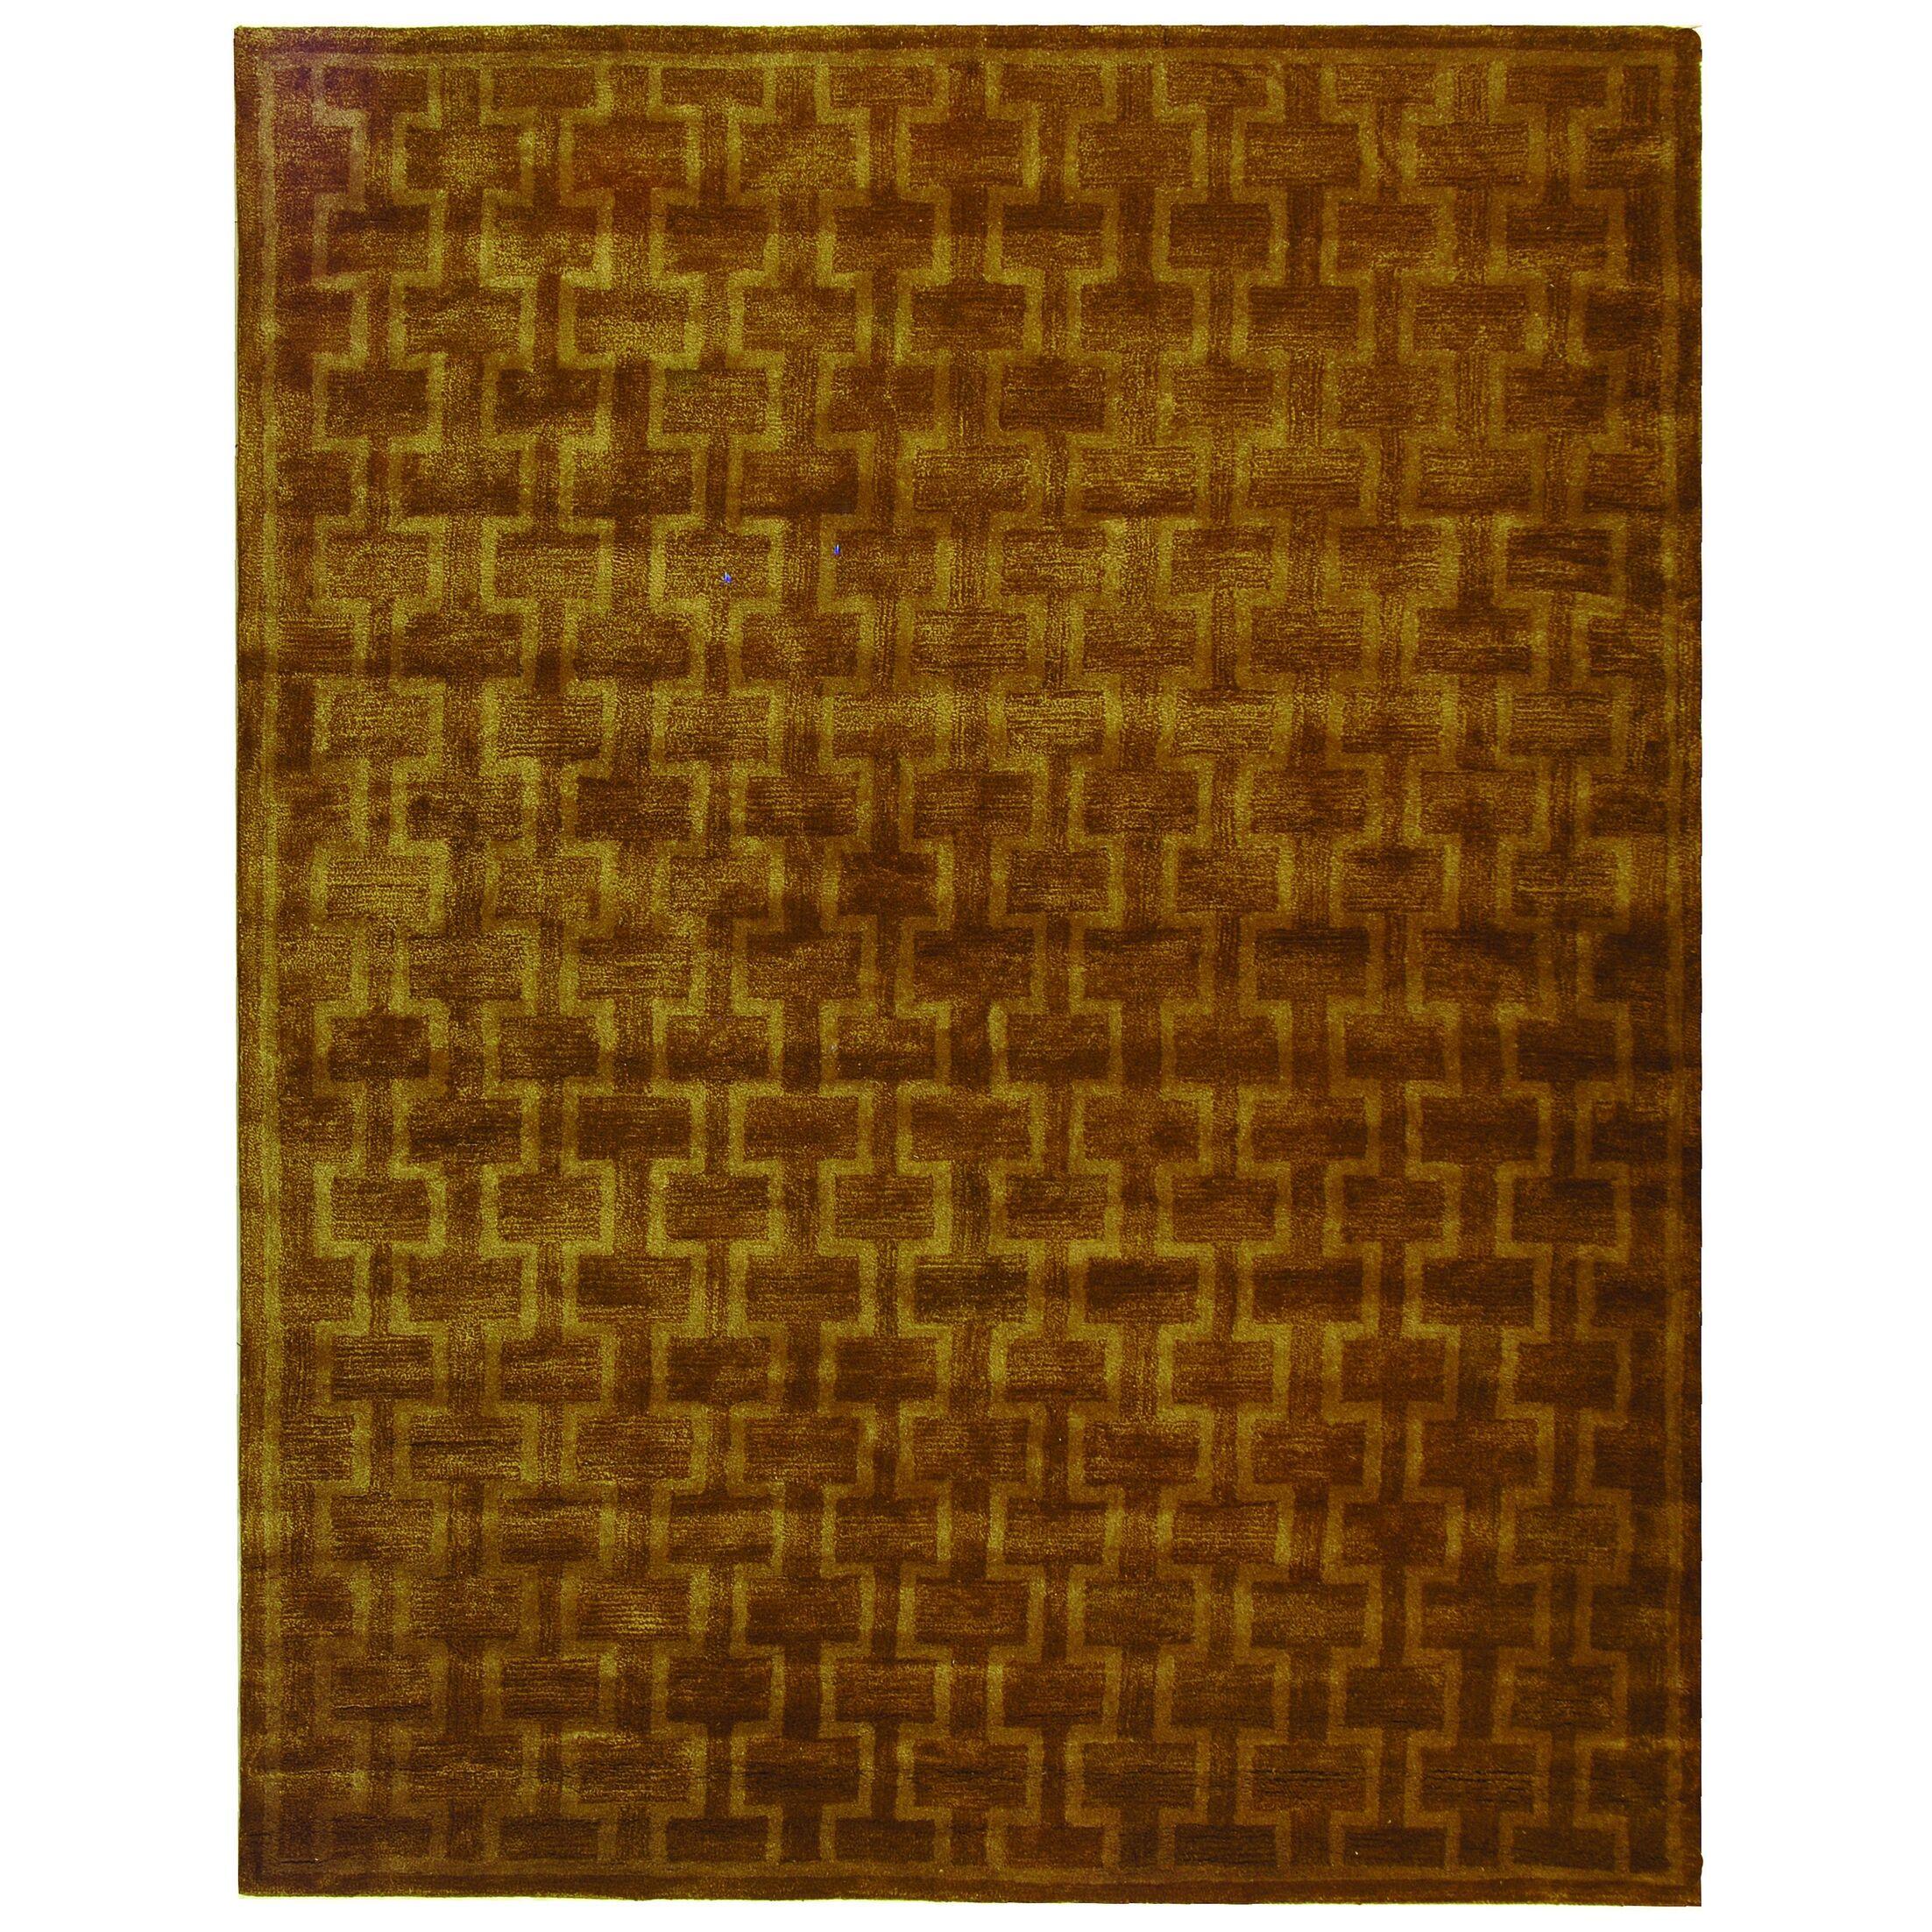 Beacon Gold/Brown Area Rug Rug Size: Rectangle 5' x 8'